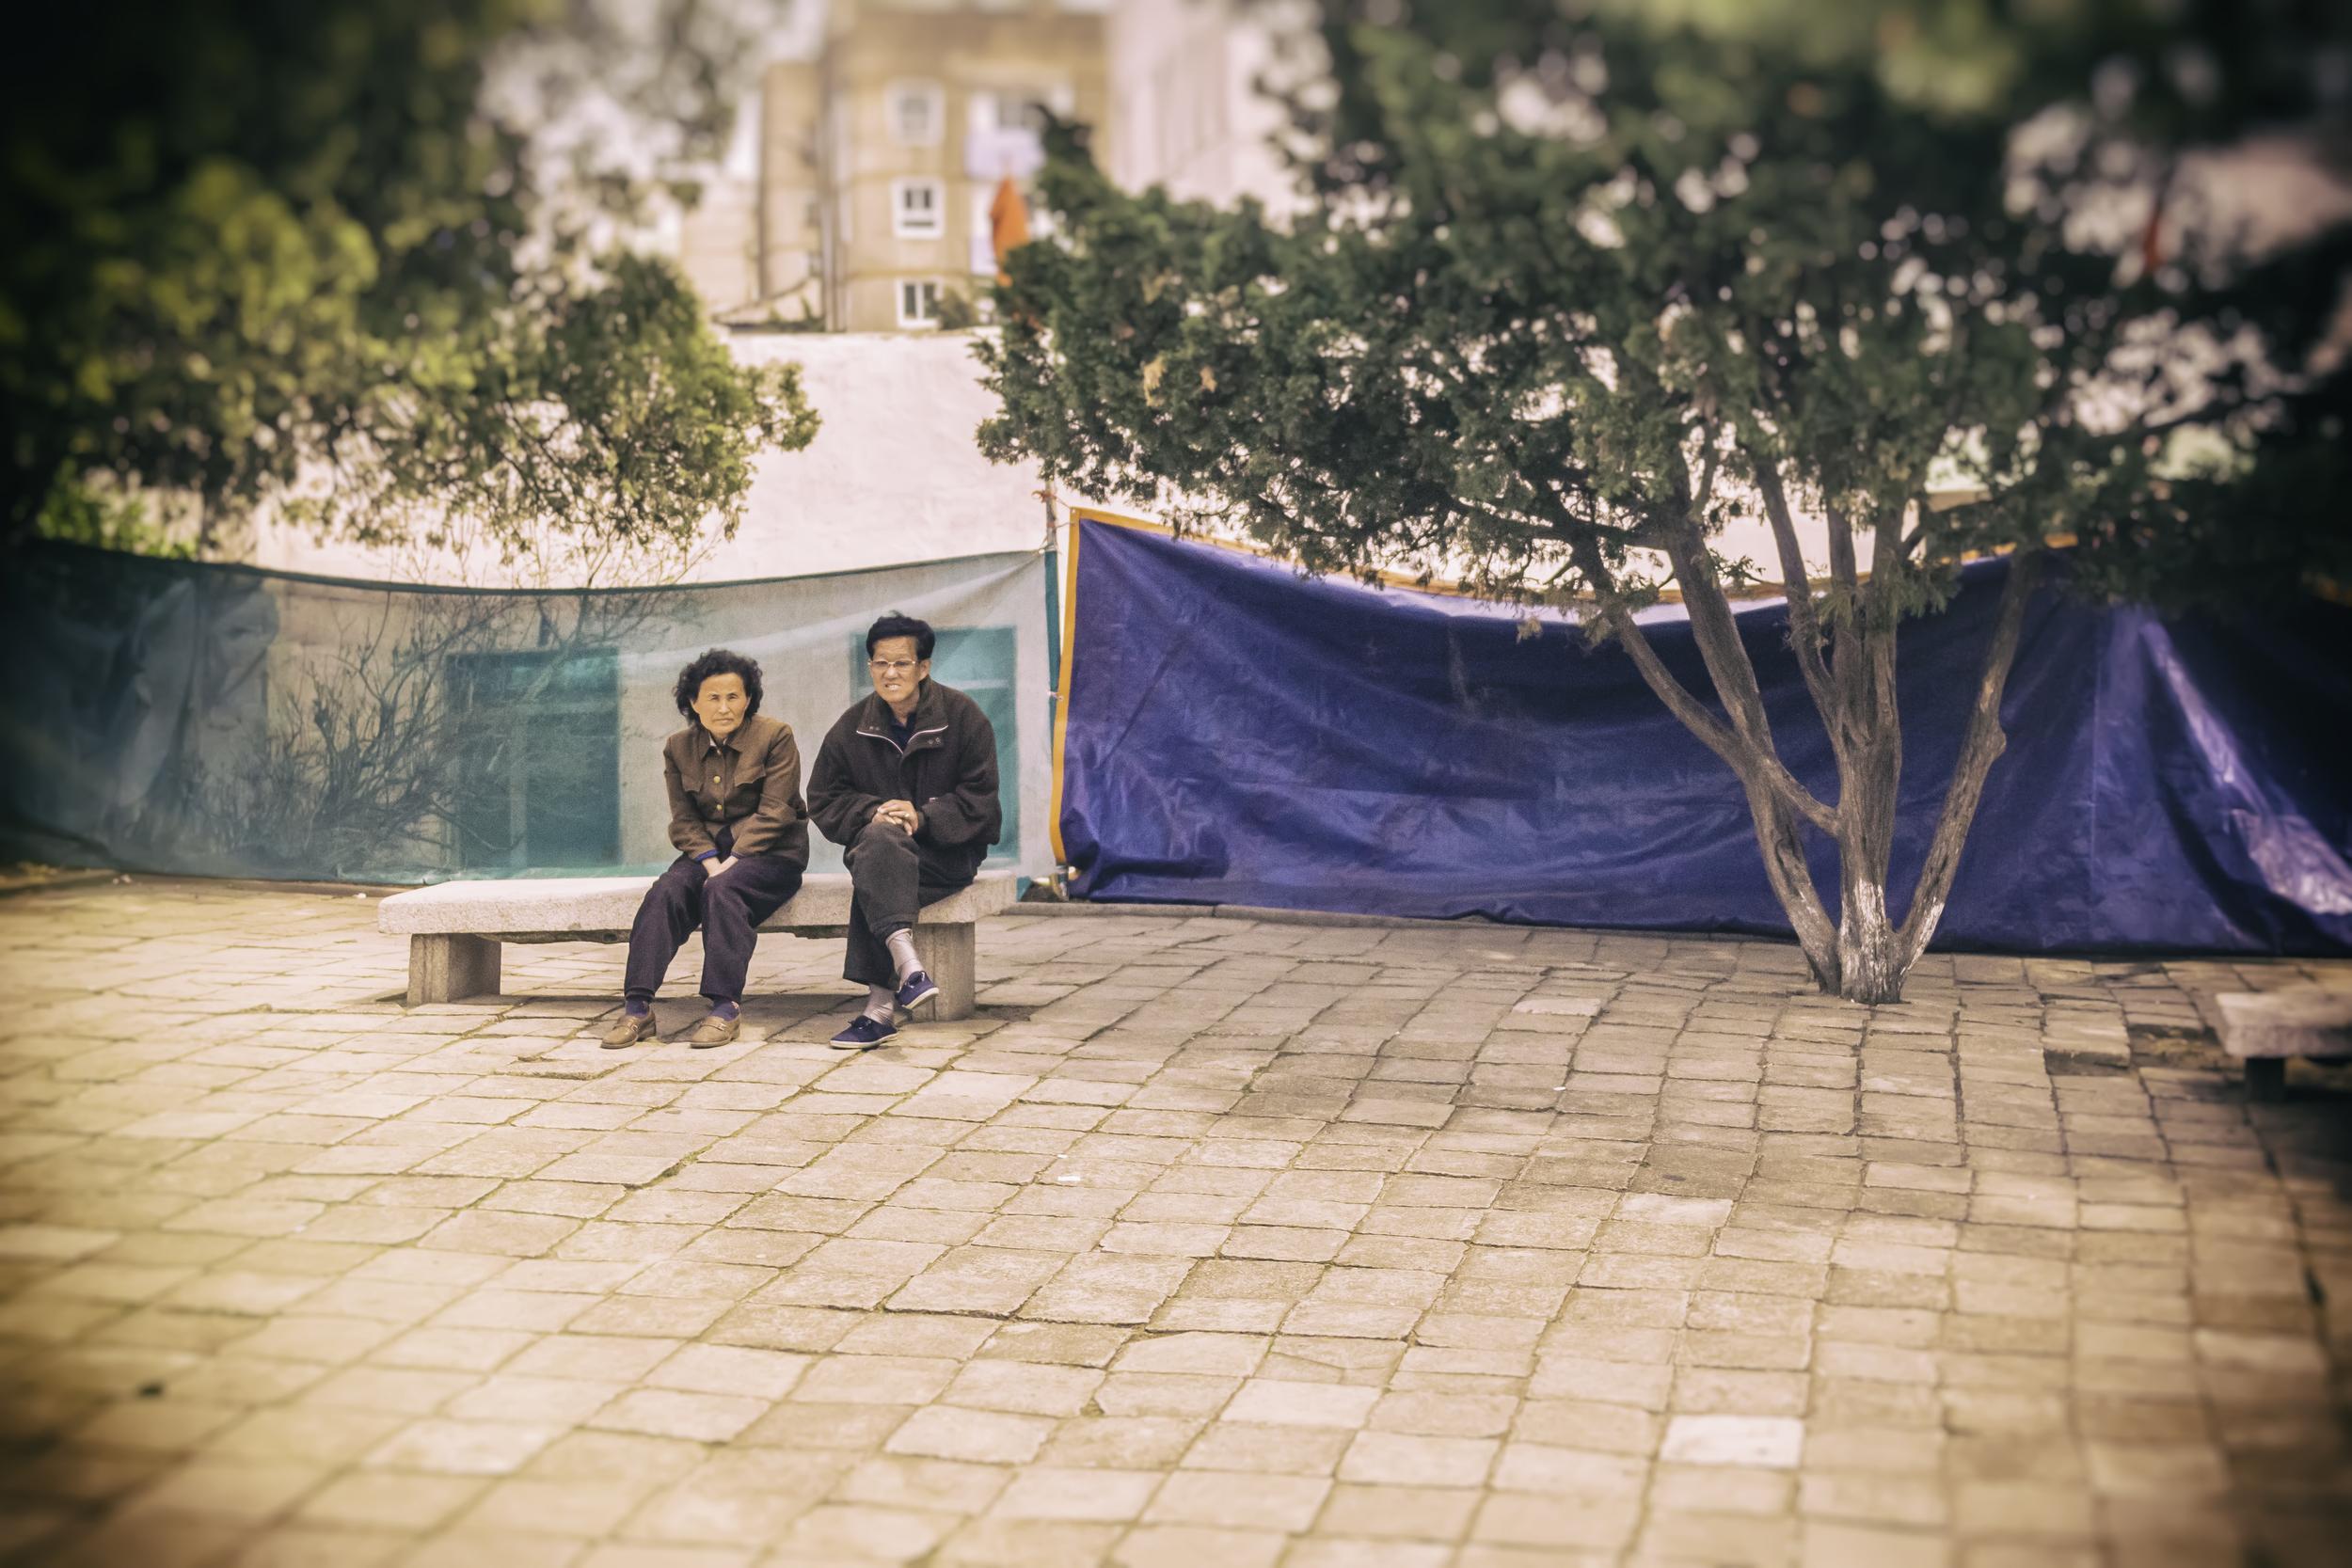 North Korean Couple On A Bench